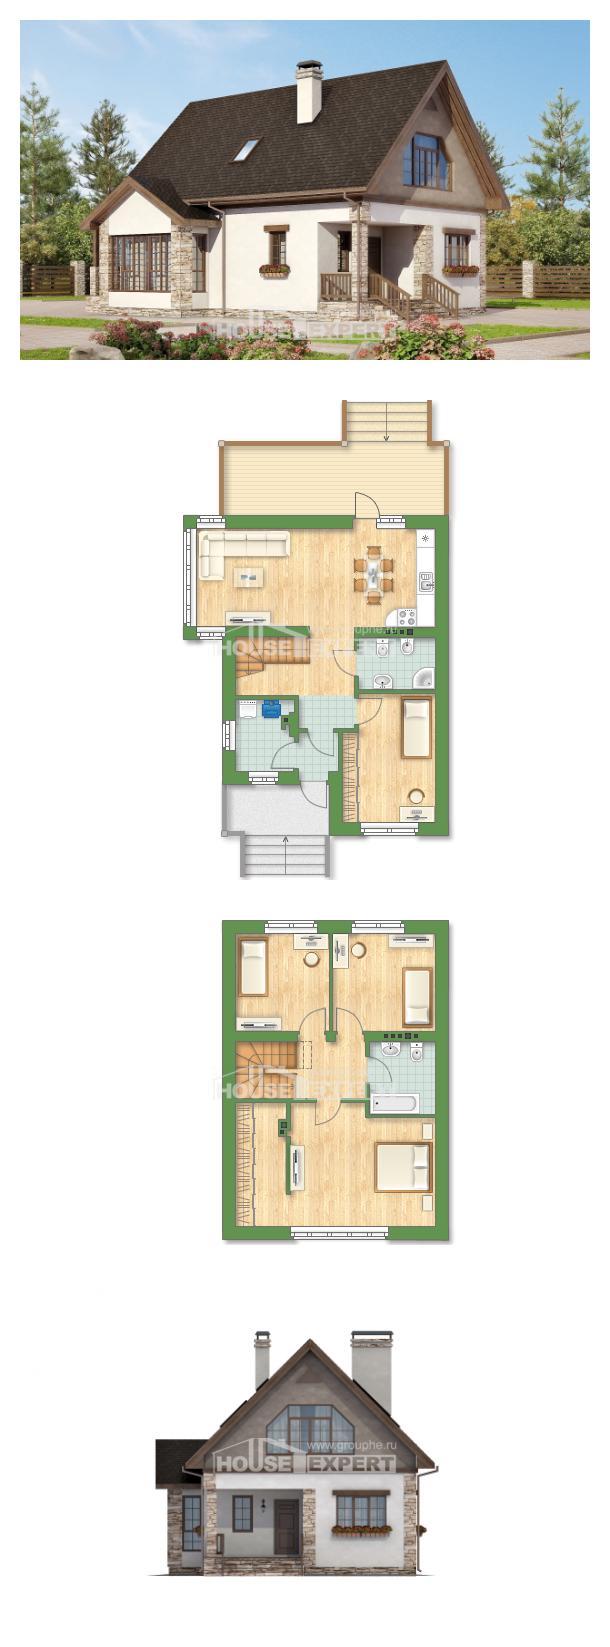 Проект дома 140-002-Л | House Expert